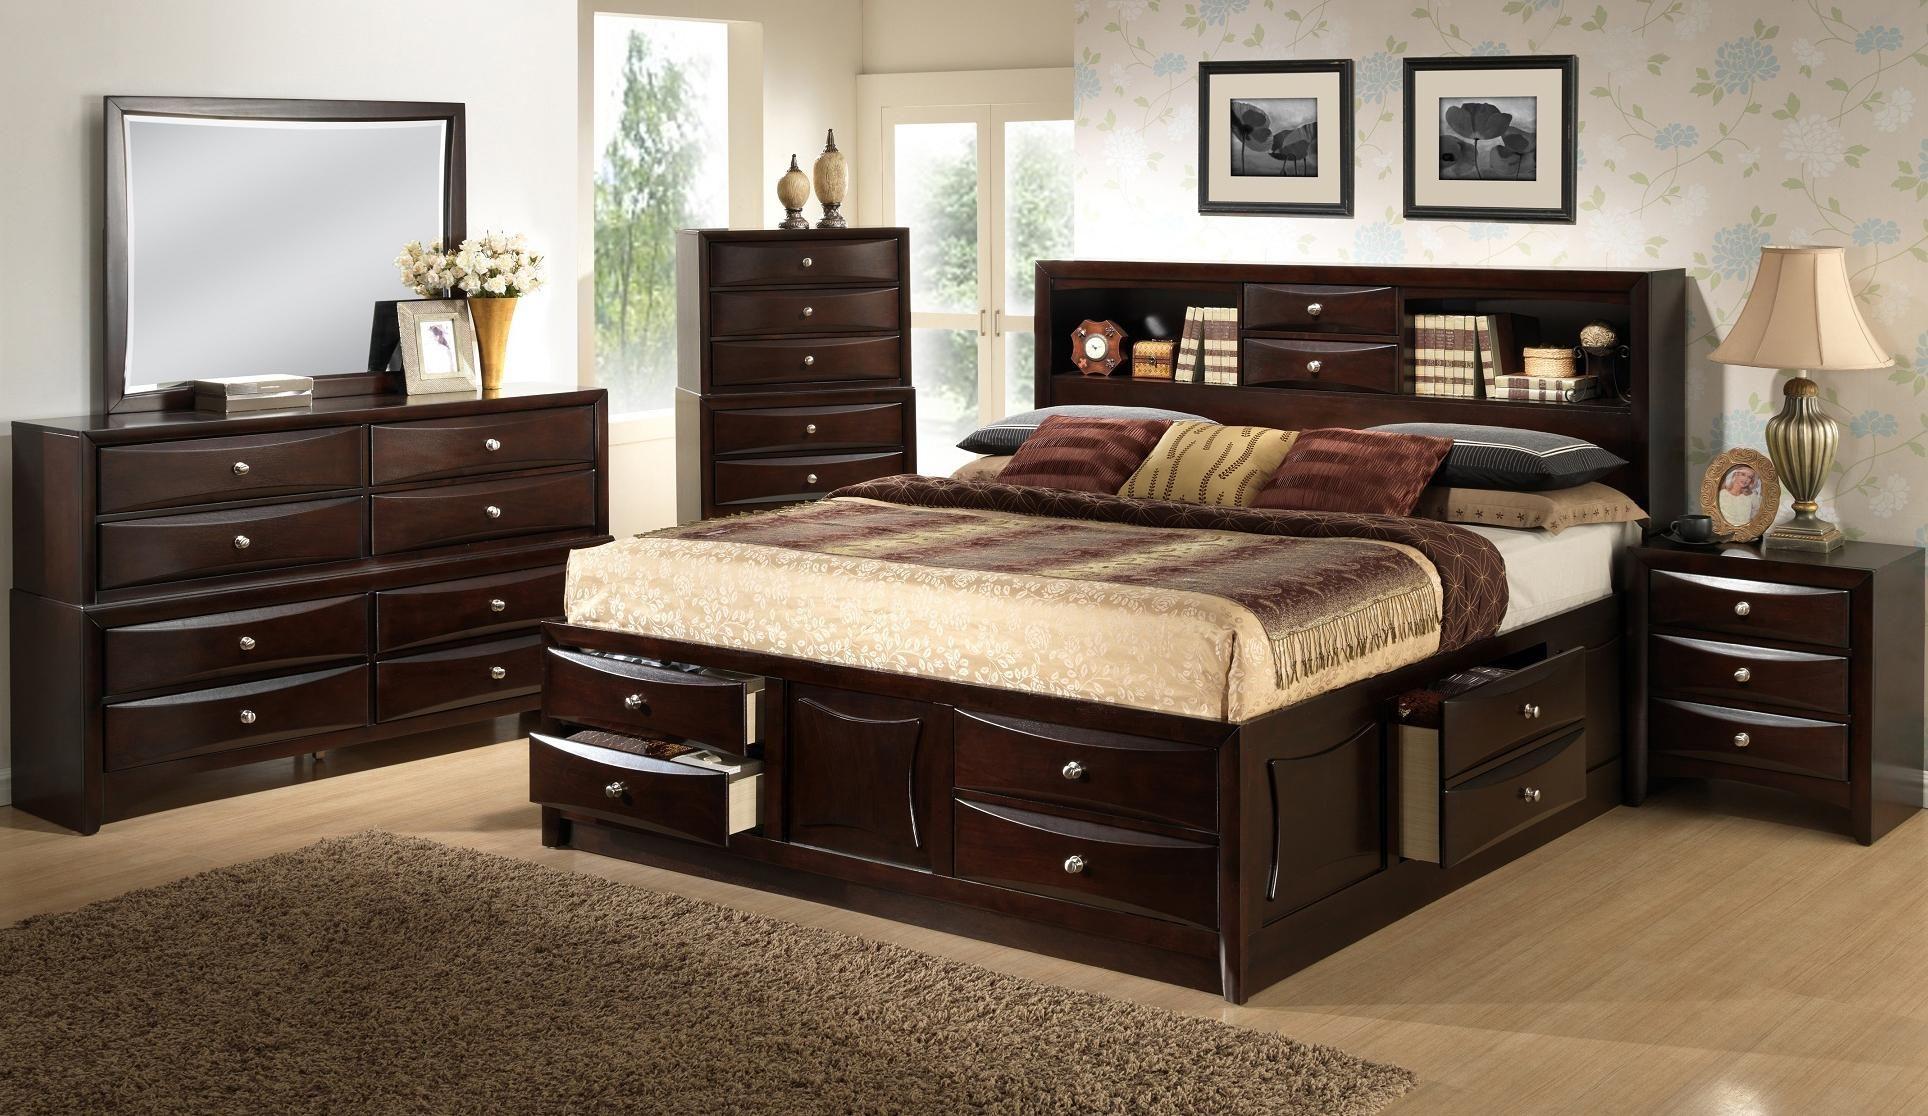 My Future Bed Need Wood Bedroom Sets Bedroom Sets Bookshelf